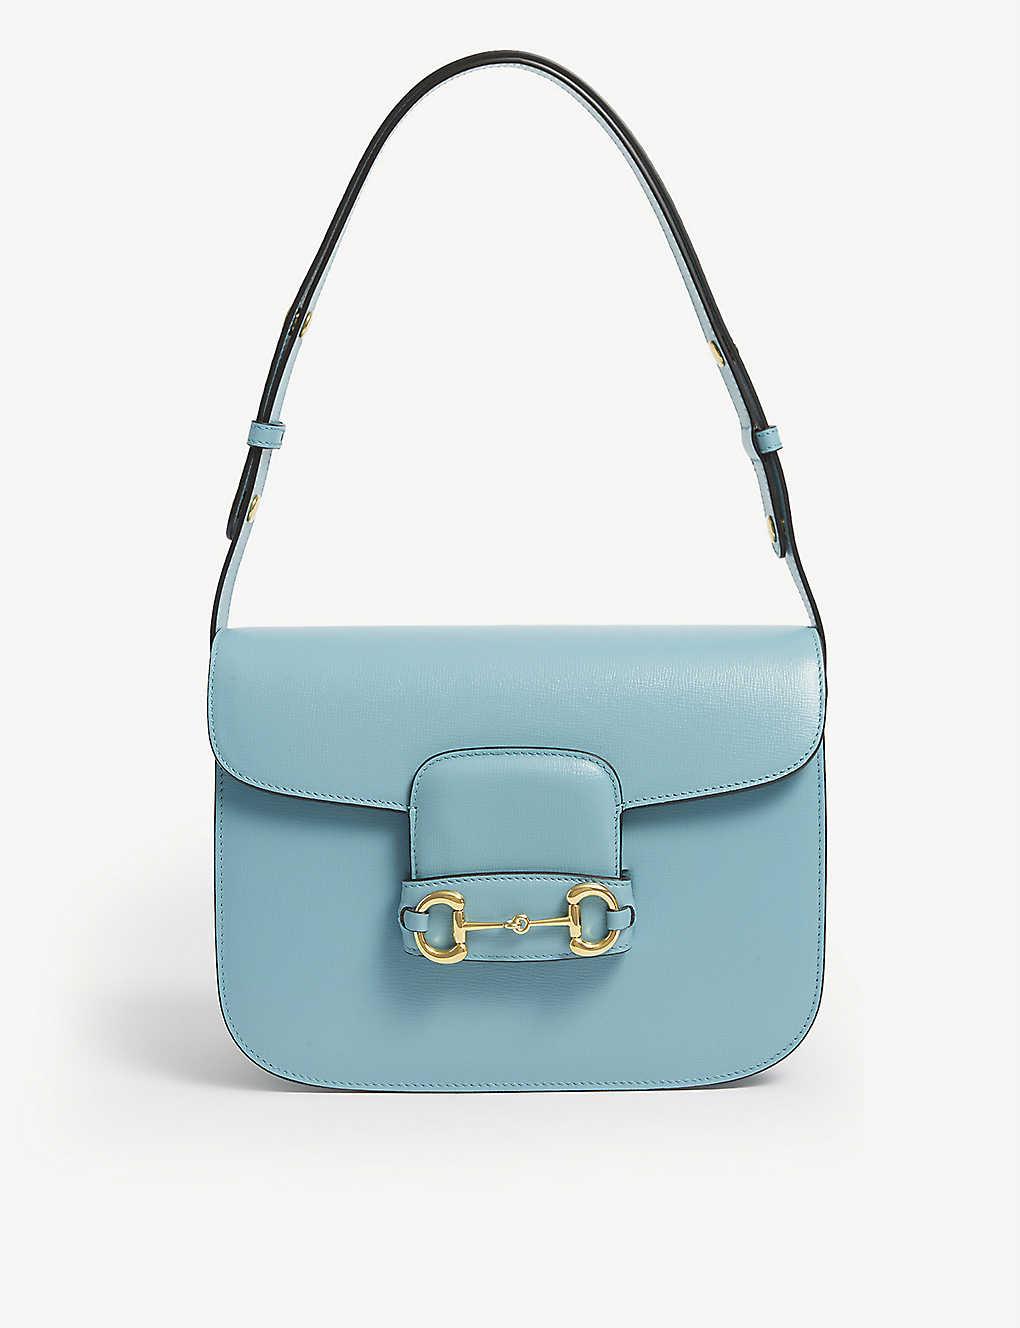 GUCCI: 1955 Horsebit leather shoulder bag